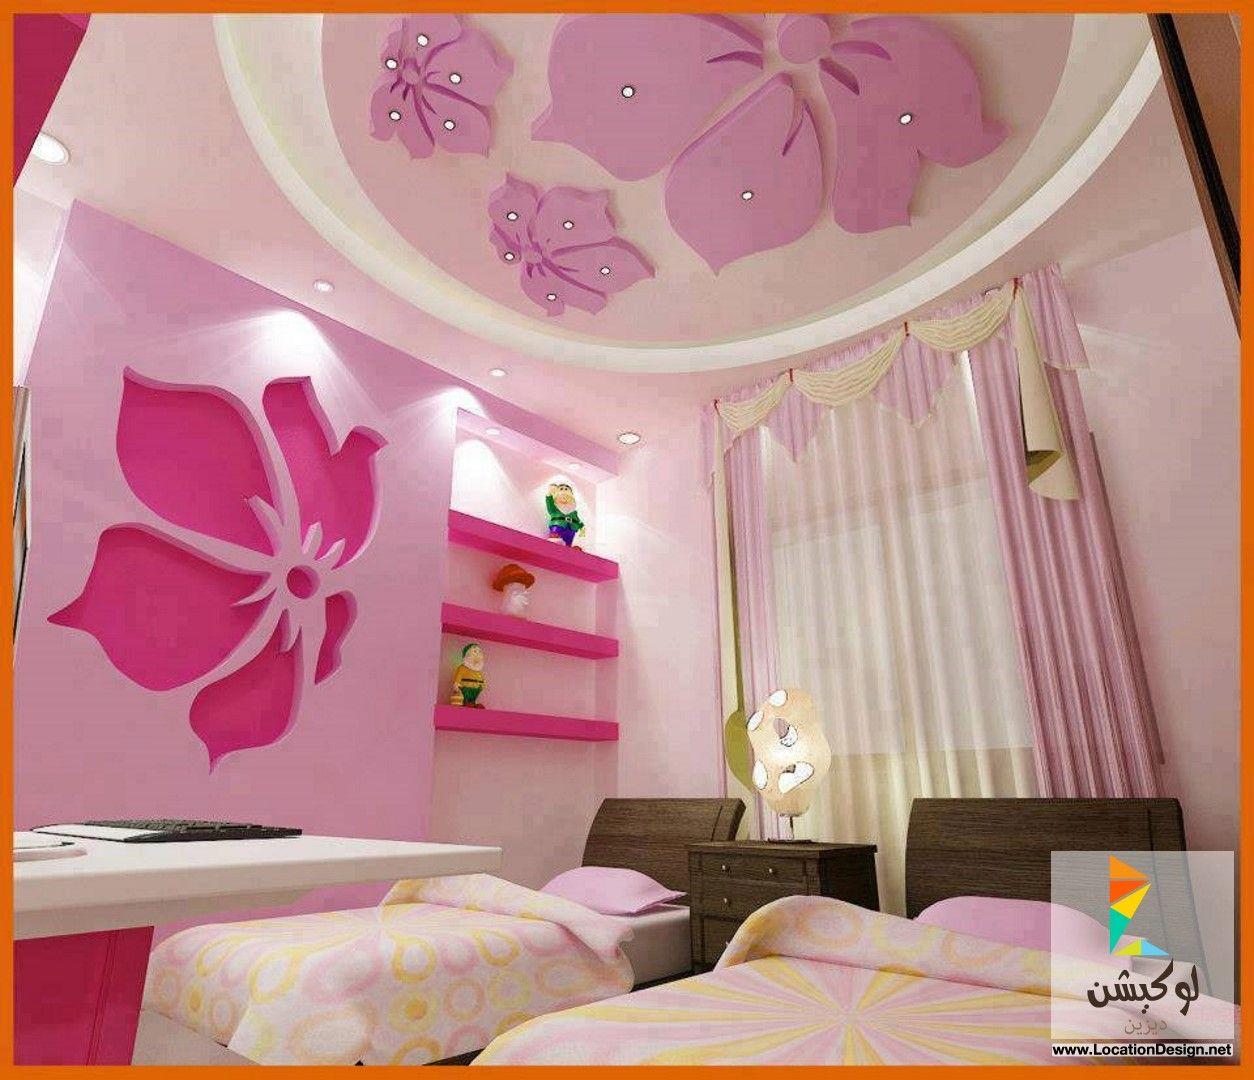 احدث تصاميم غرف اطفال مودرن بالصور لوكيشن ديزاين تصميمات ديكورات أفكار جديدة مصر Locati Children Room Girl Ceiling Design Bedroom Kids Room Design